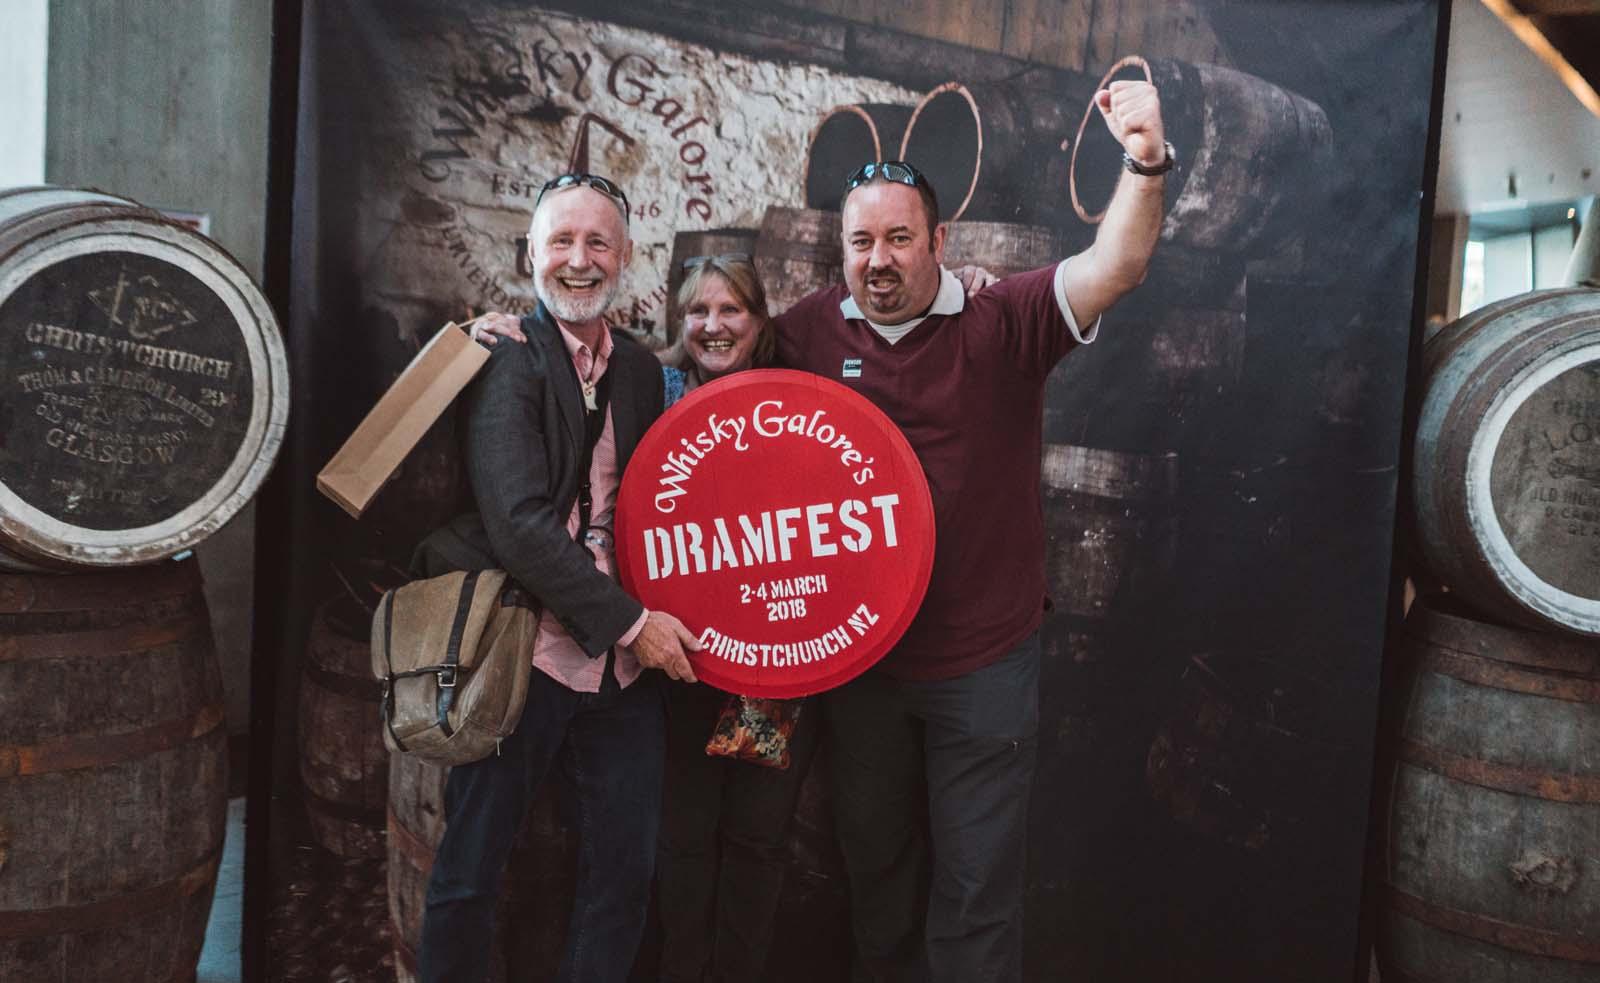 Dramfest 2018 for Whisky Galore-160.jpg